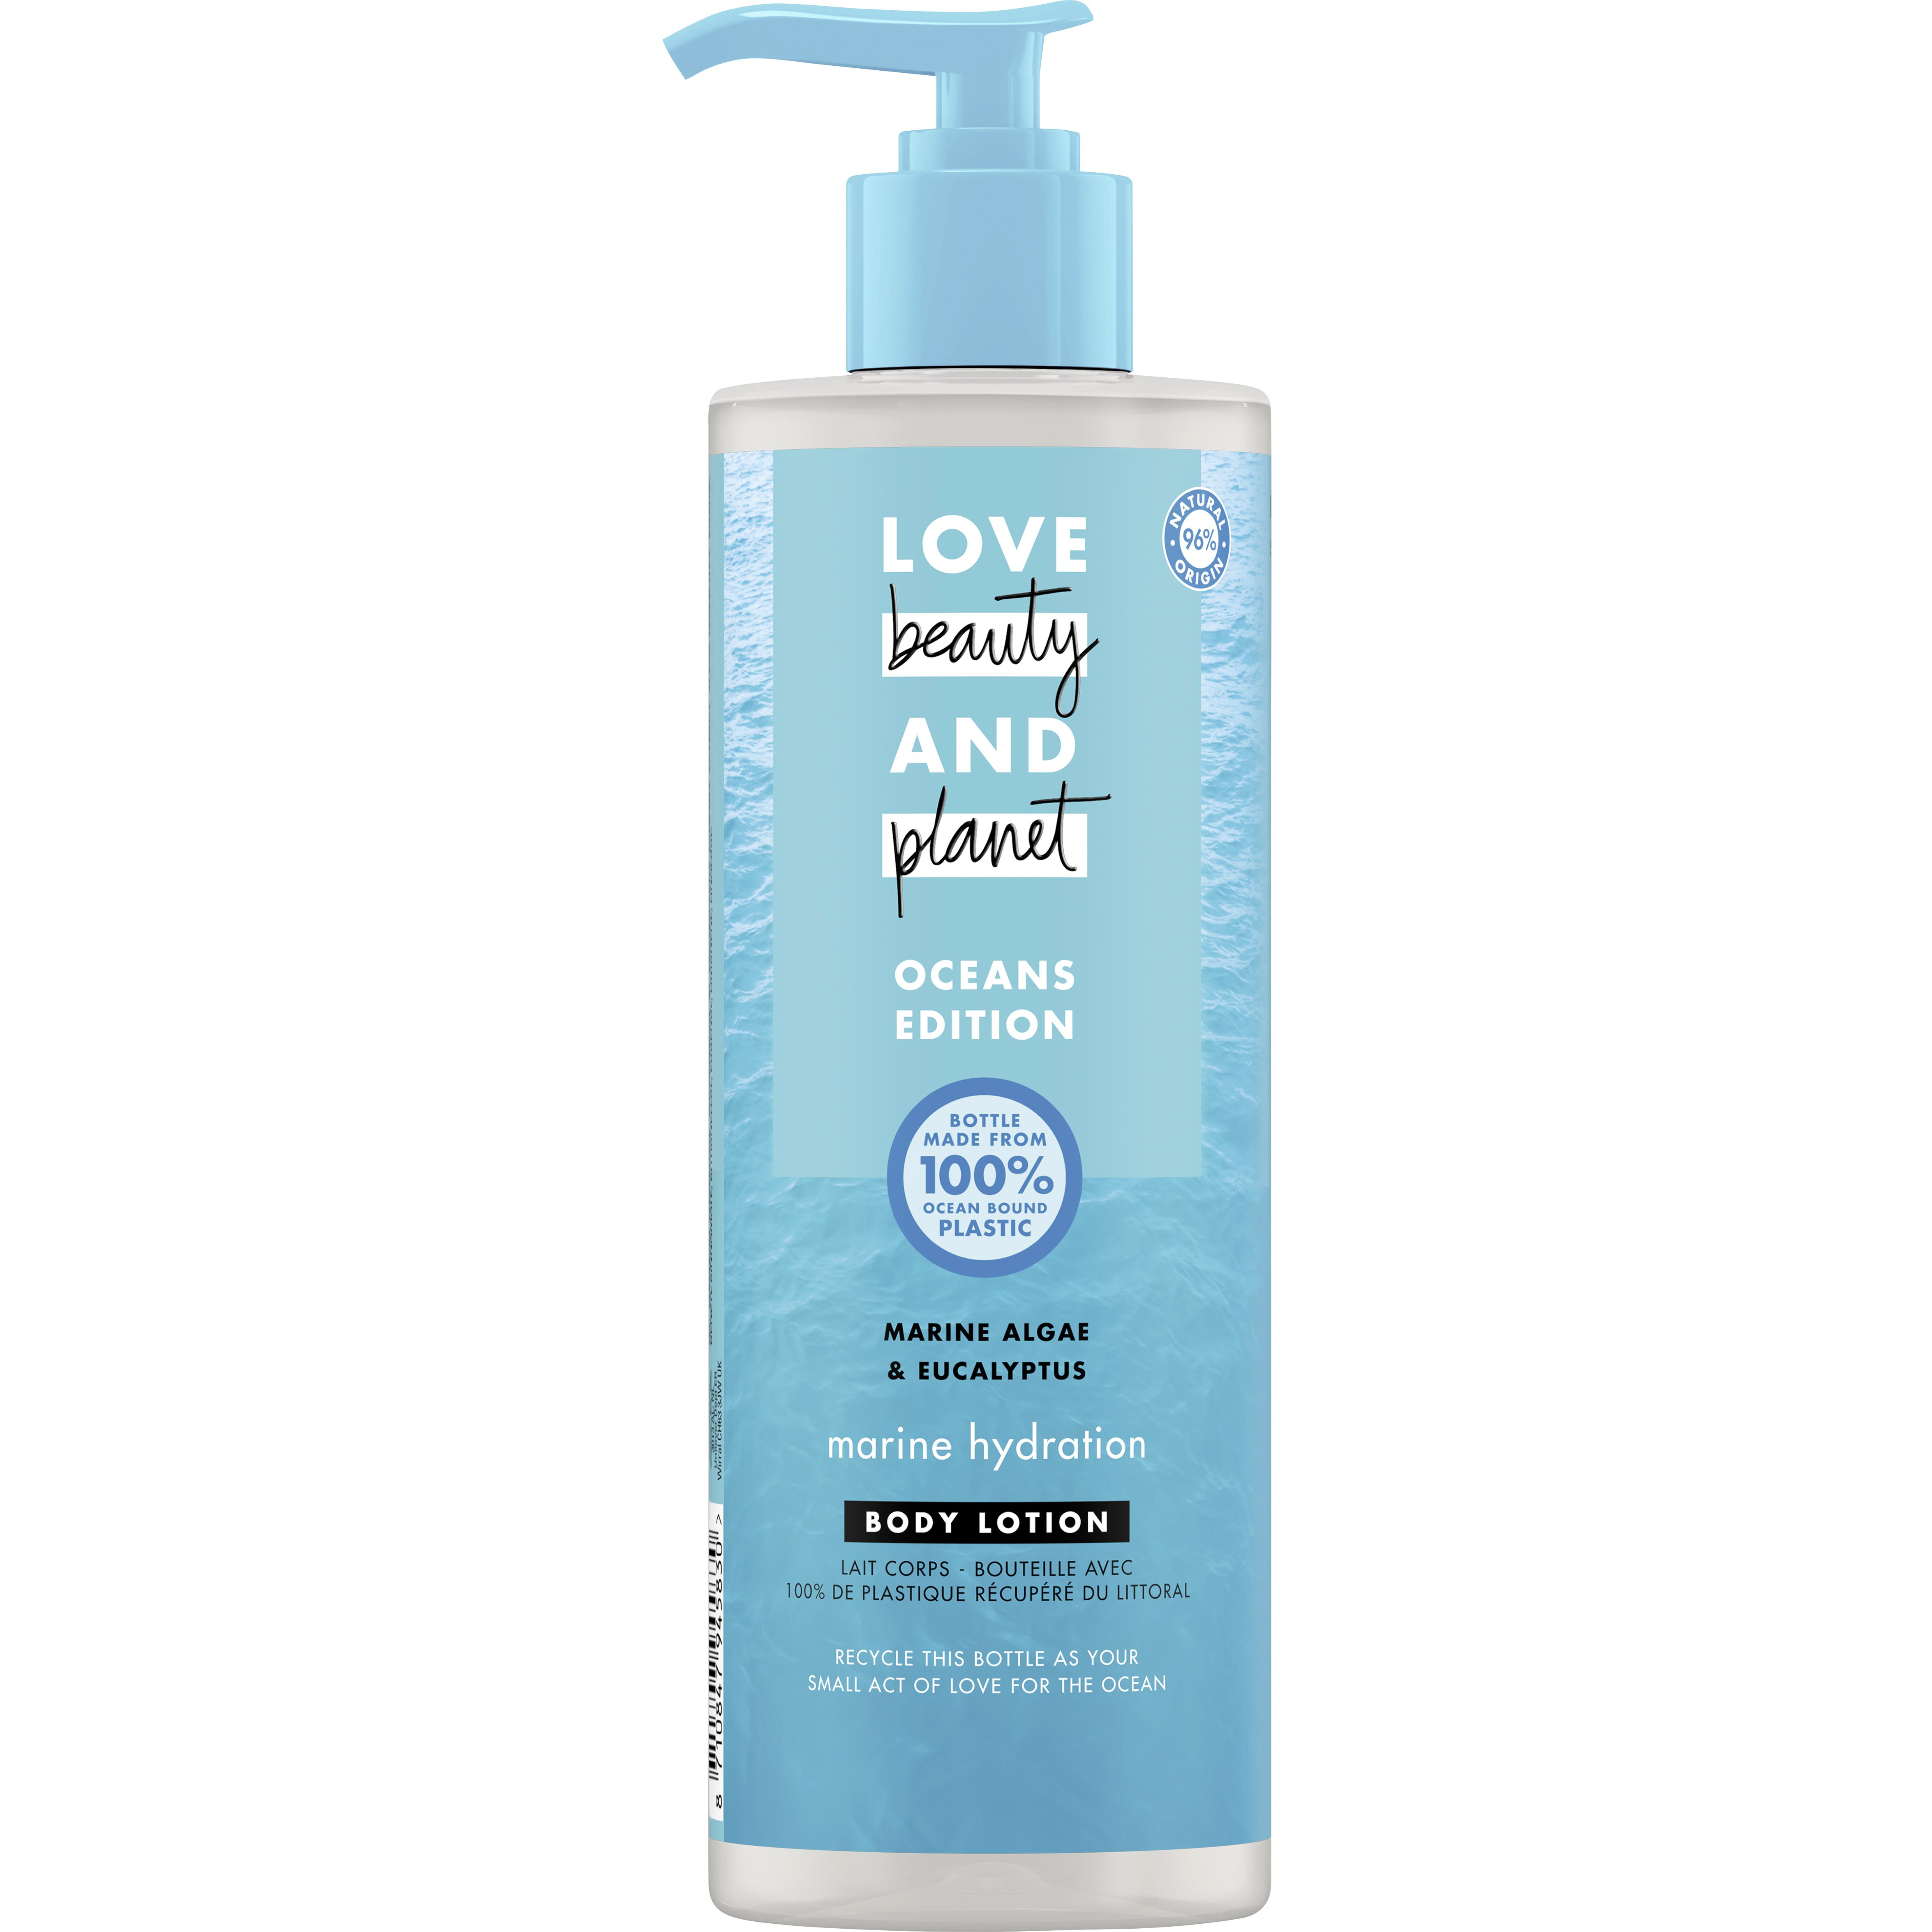 Love Beauty & Planet Oceans Edition Body Lotion With Marine Algae & Eucalyptus 400ml